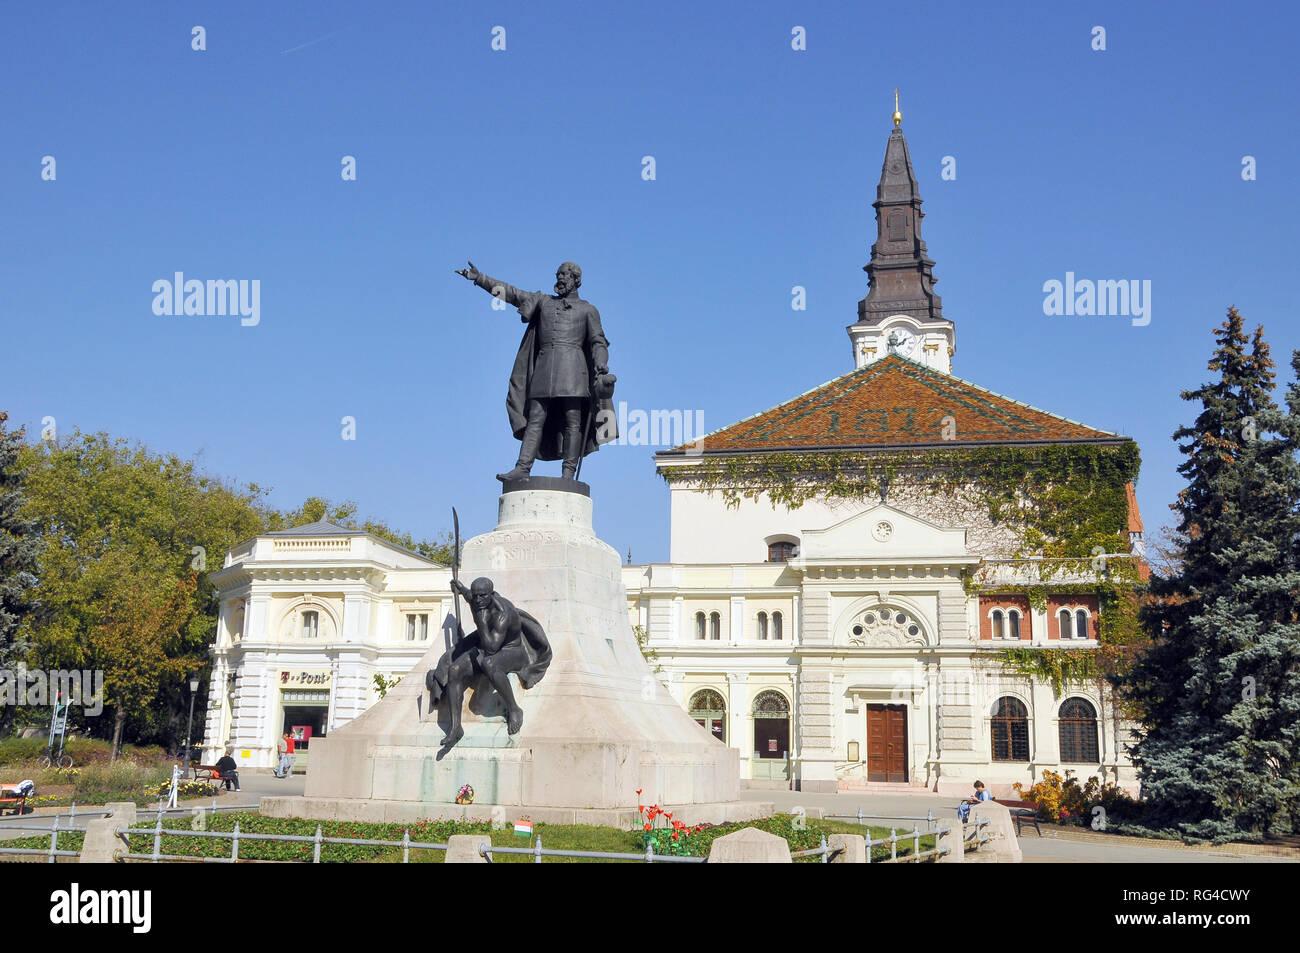 Statue of Lajos Kossuth in Kecskemét, Hungary. - Stock Image